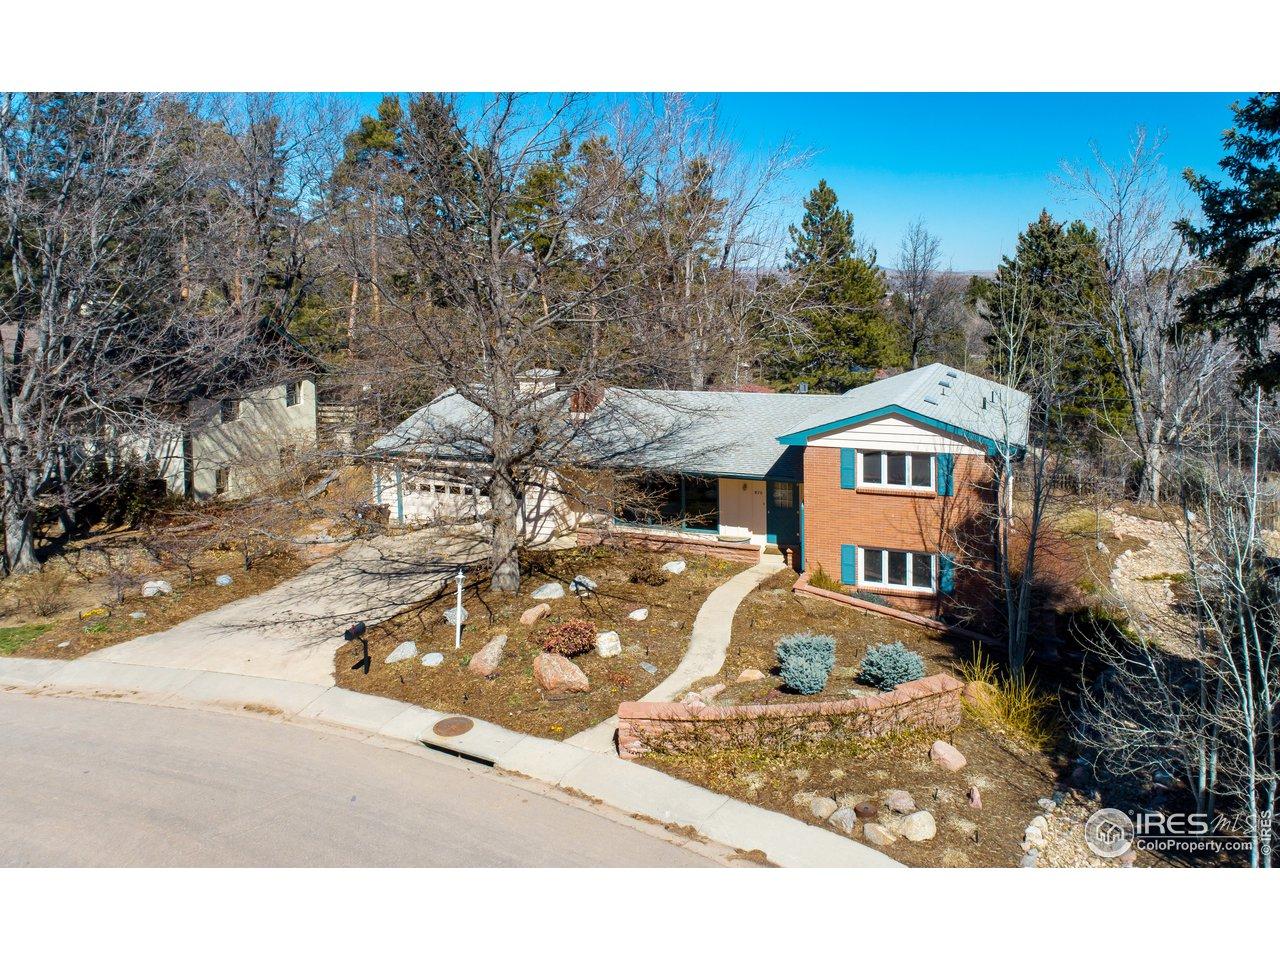 870 Willowbrook Rd, Boulder CO 80302